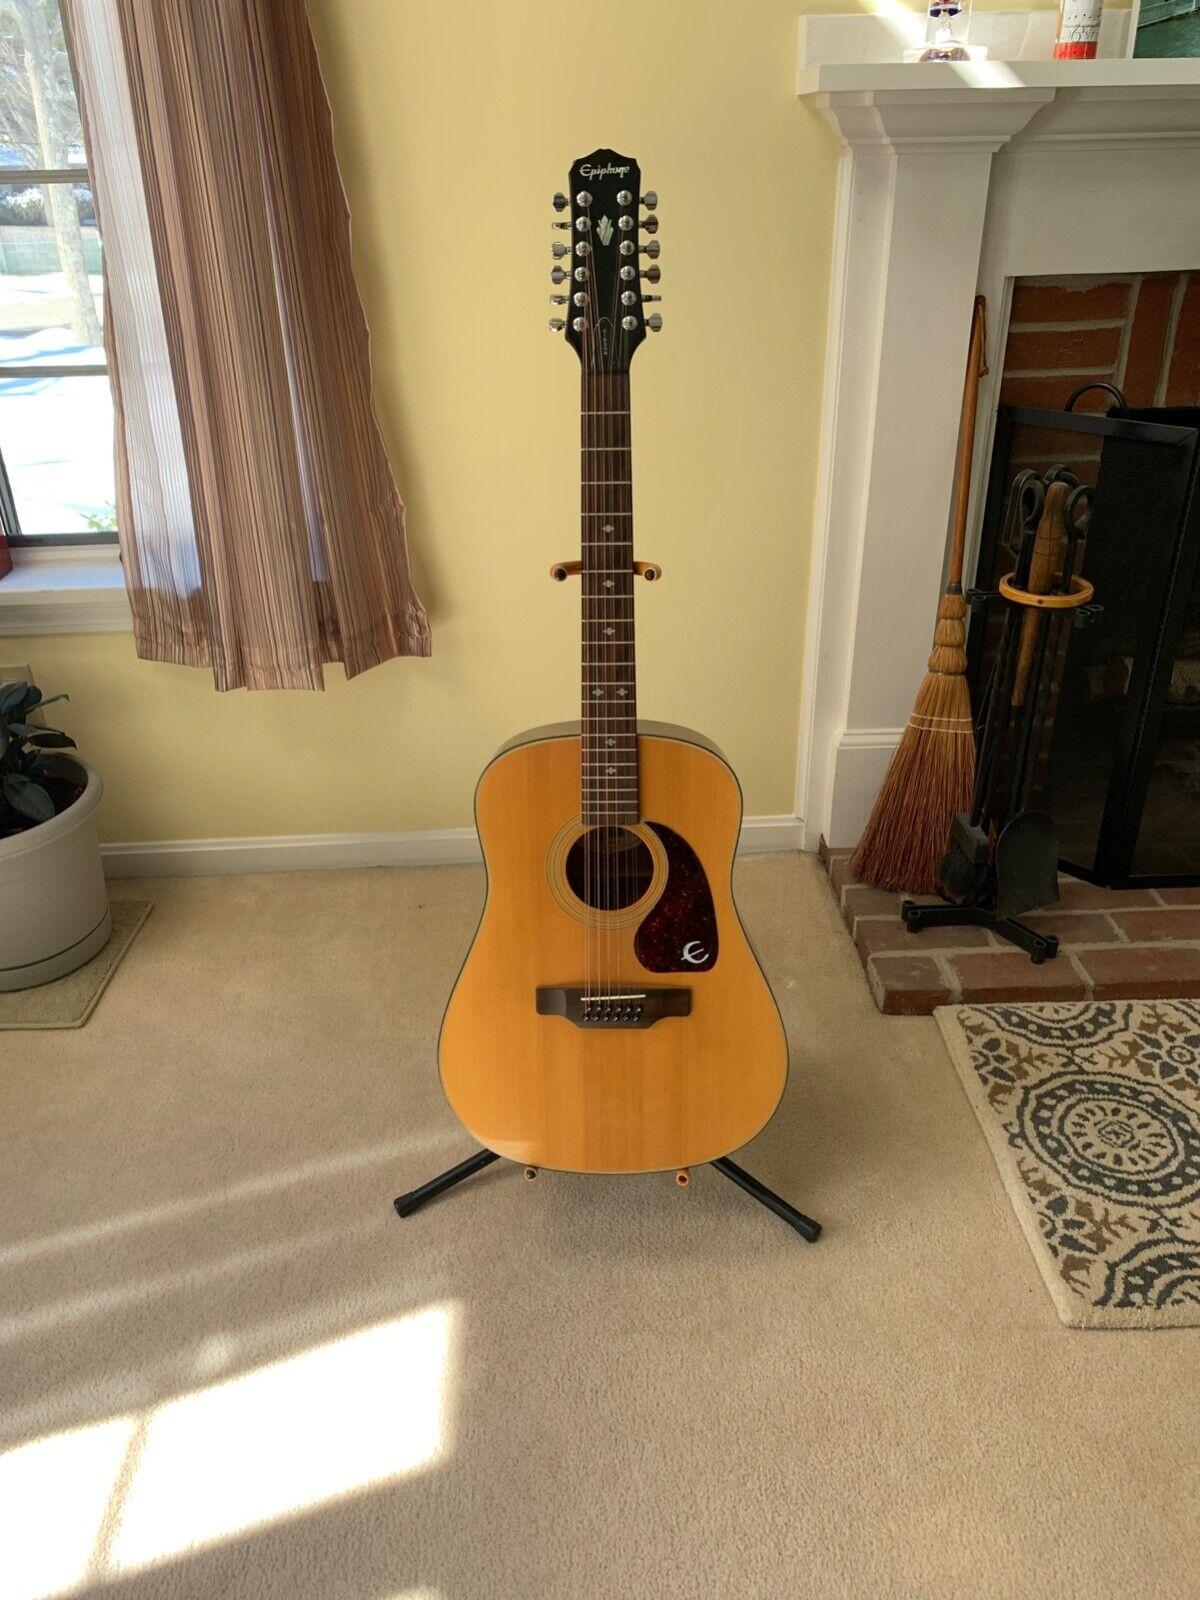 Epiphone 12 String Acoustic Guitar PR 350-12